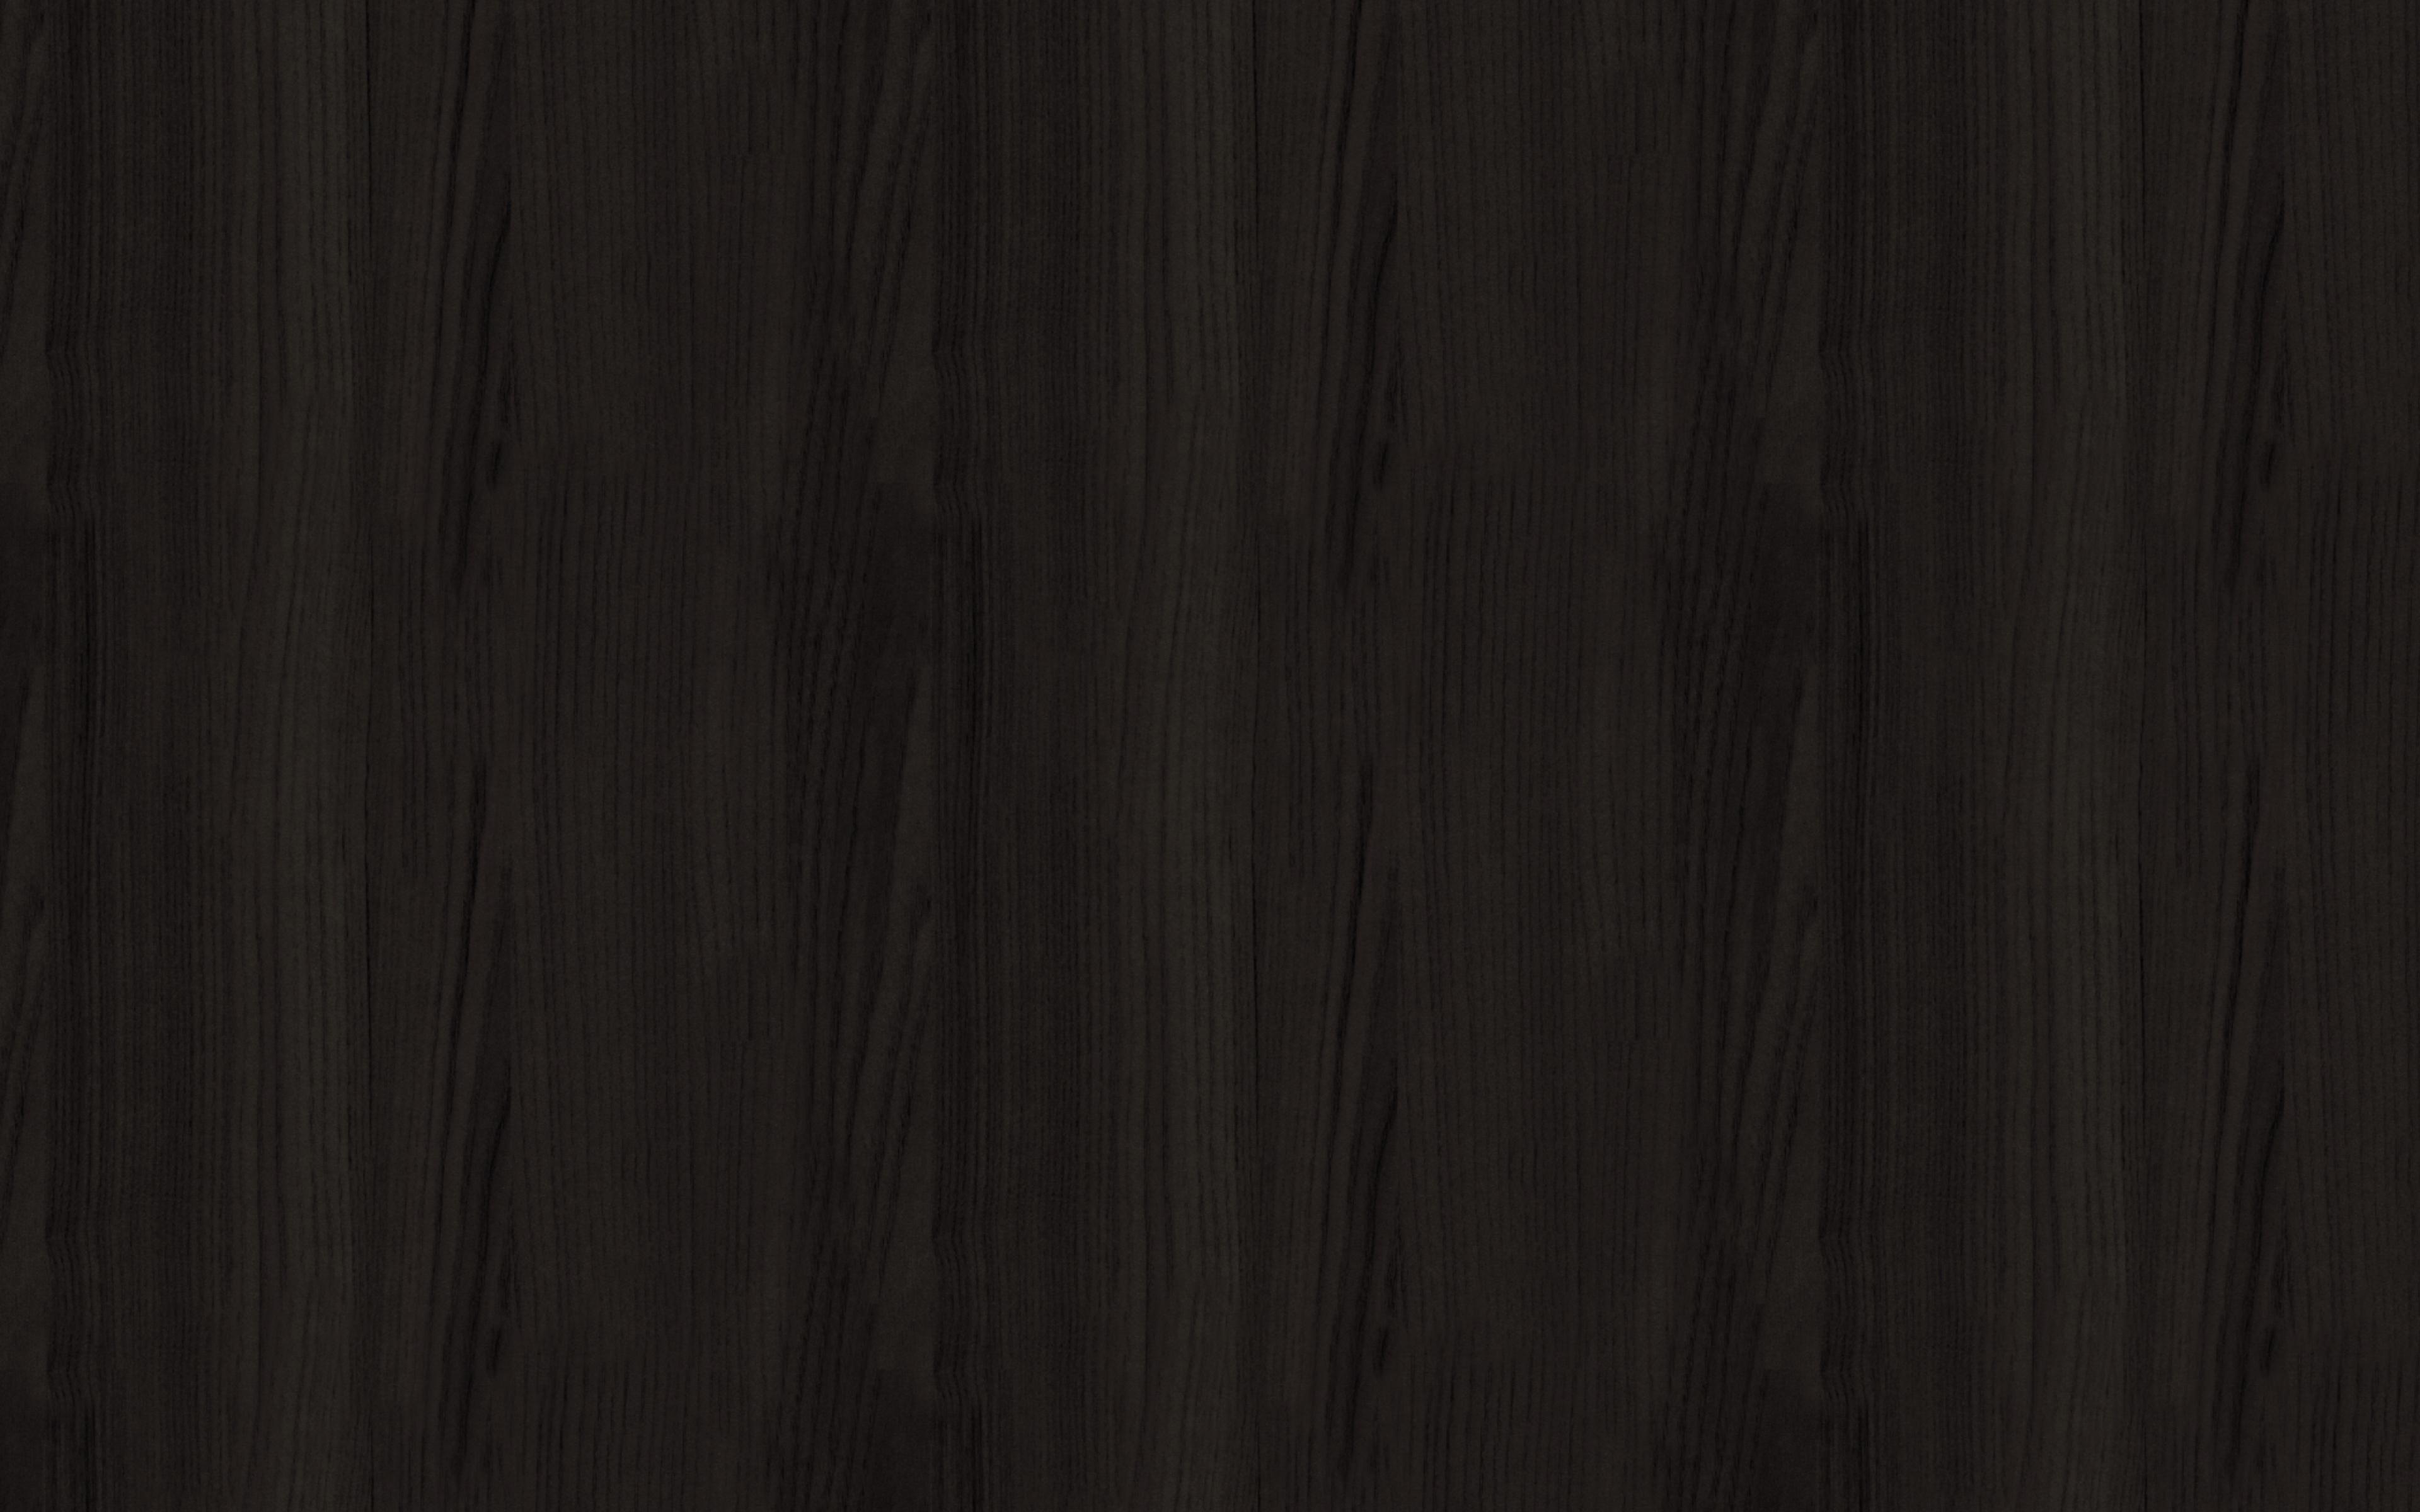 Texture Background Wood Dark Wallpaper Background Ultra HD 4K 3840x2400